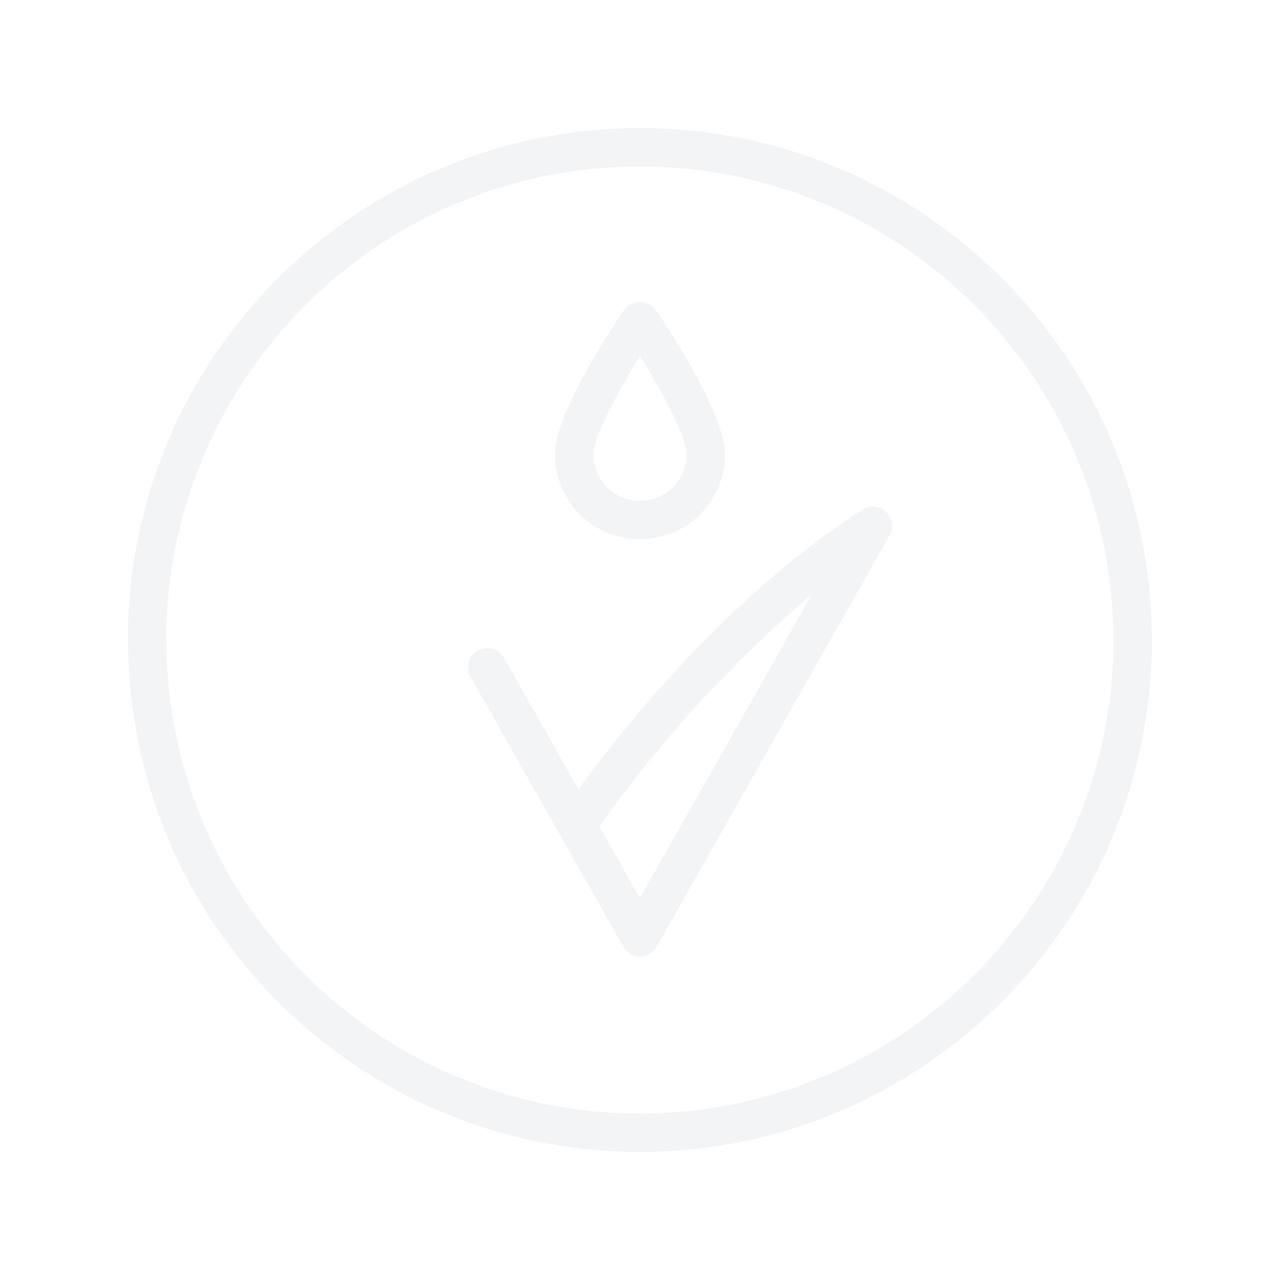 E.L.F. Brush Cleanser Wipes 10pcs